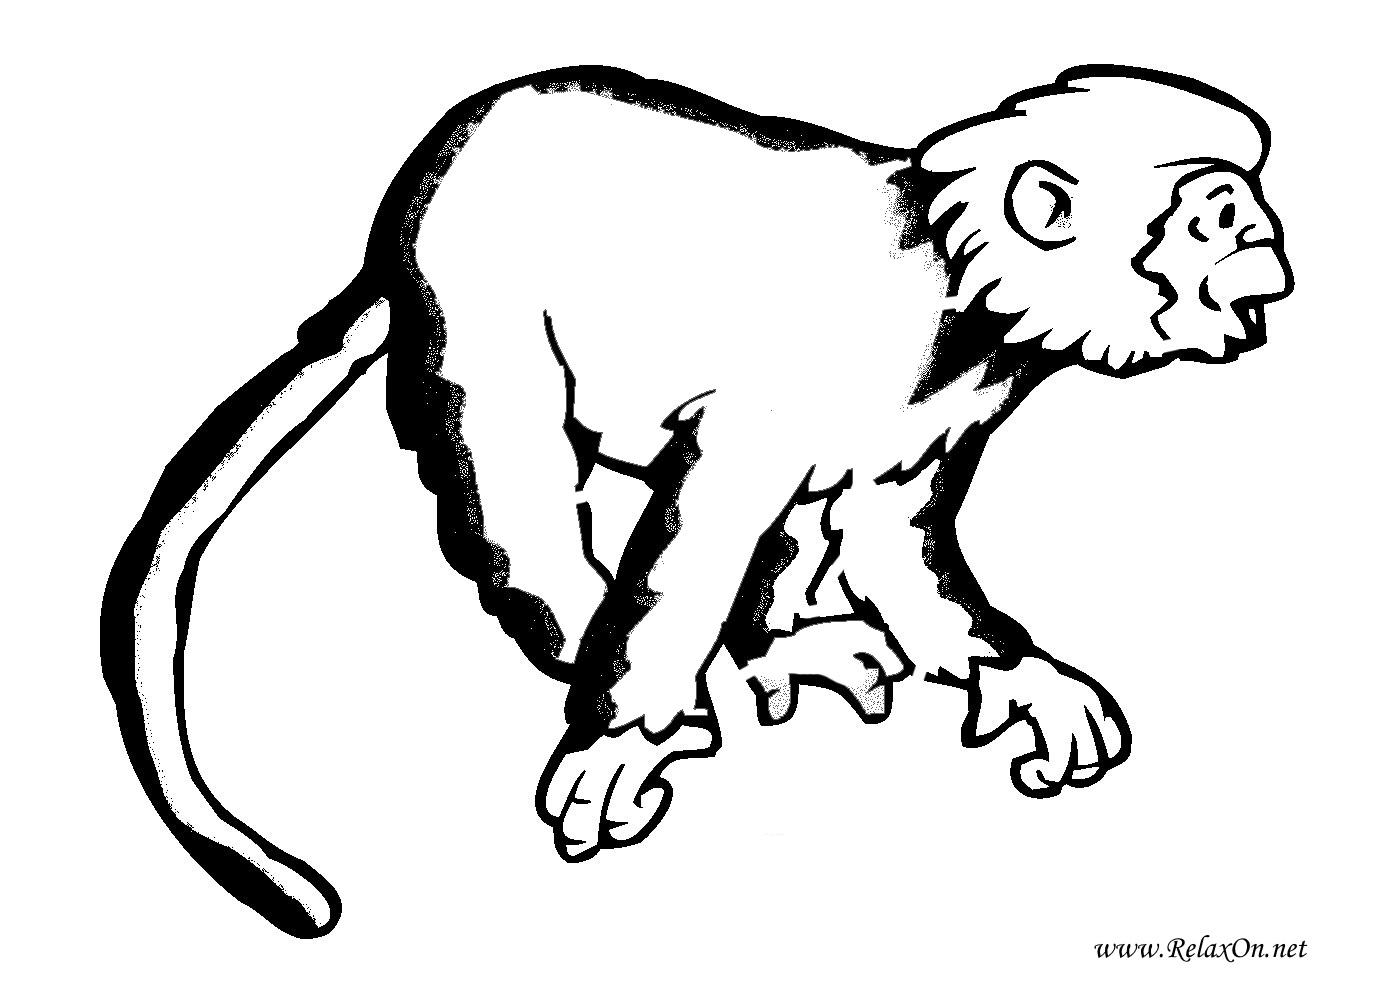 5-шаблон обезьяны на Новый год